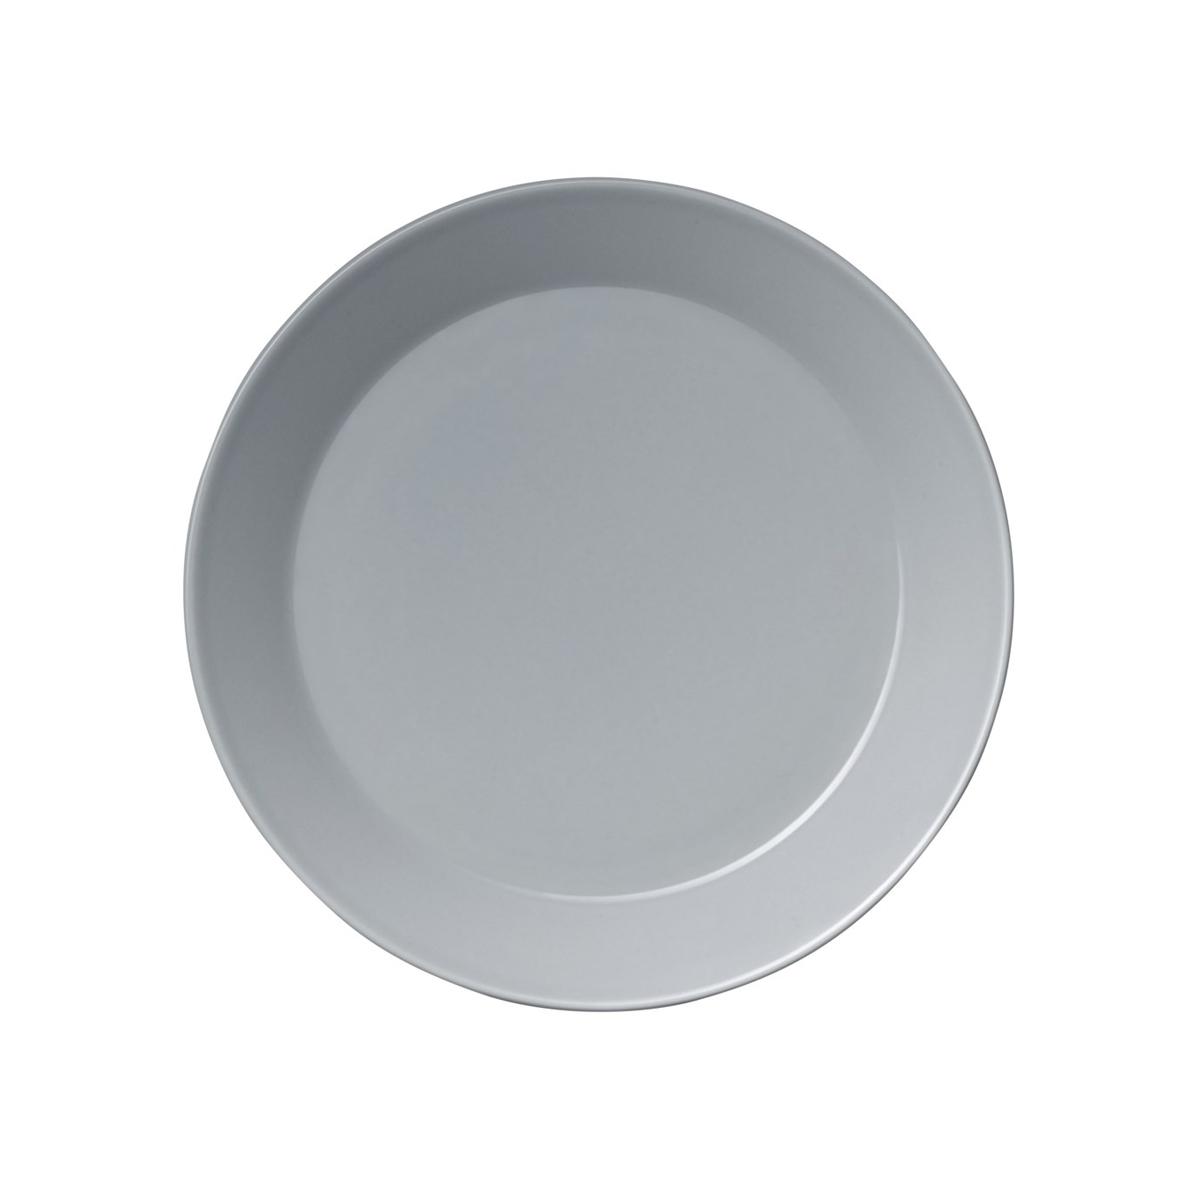 Teema_plate_17cm_pearl_grey